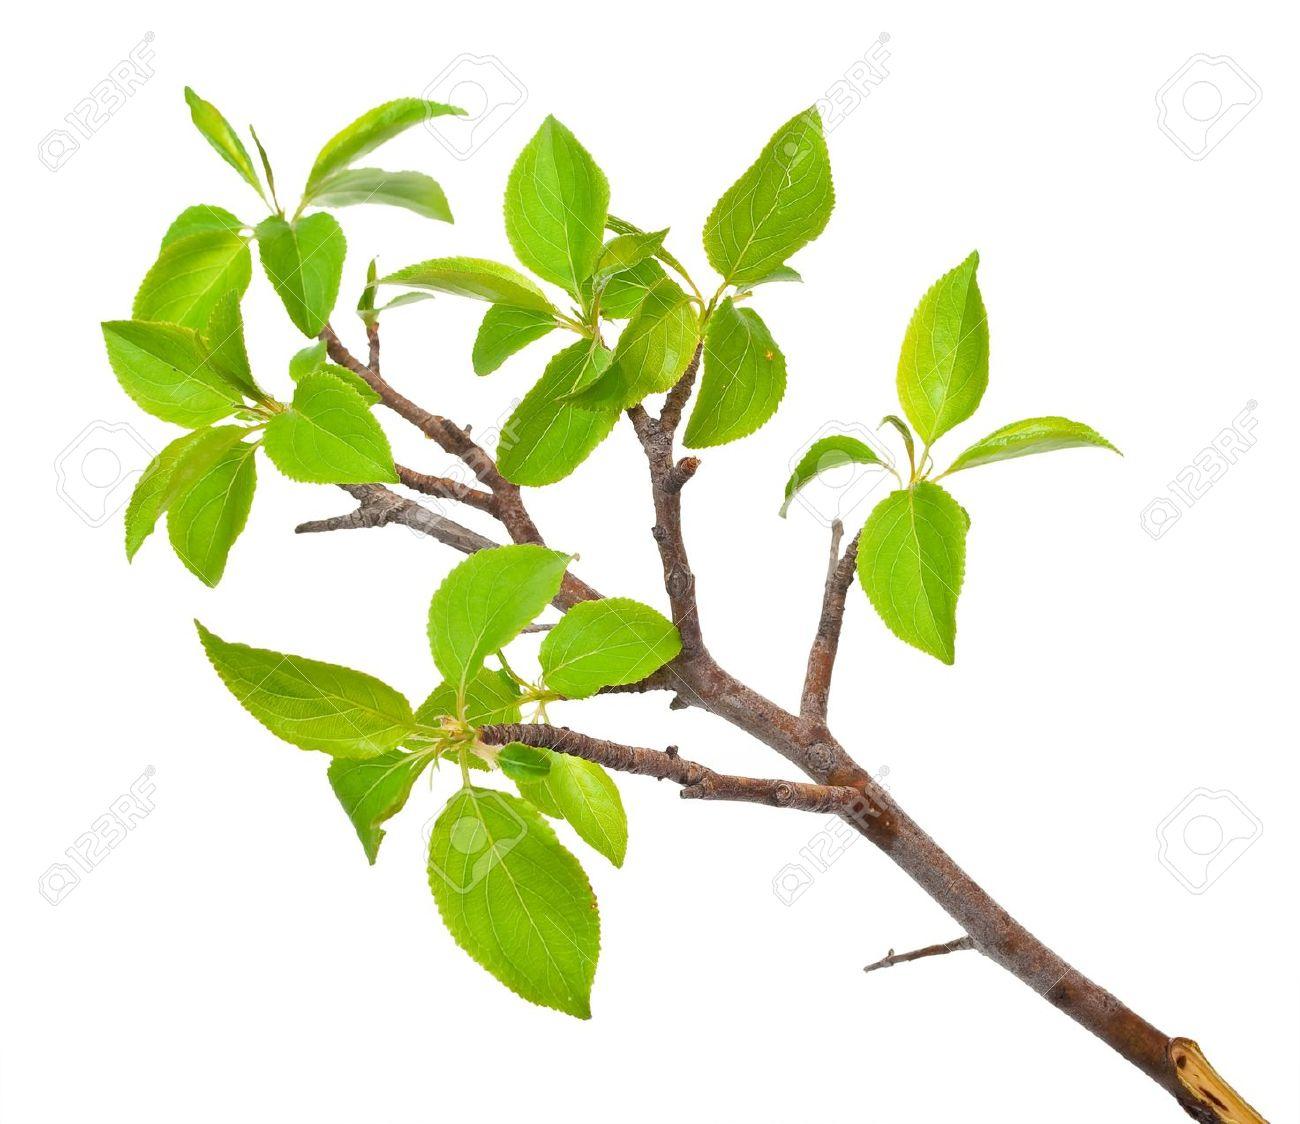 Tree bud clipart.